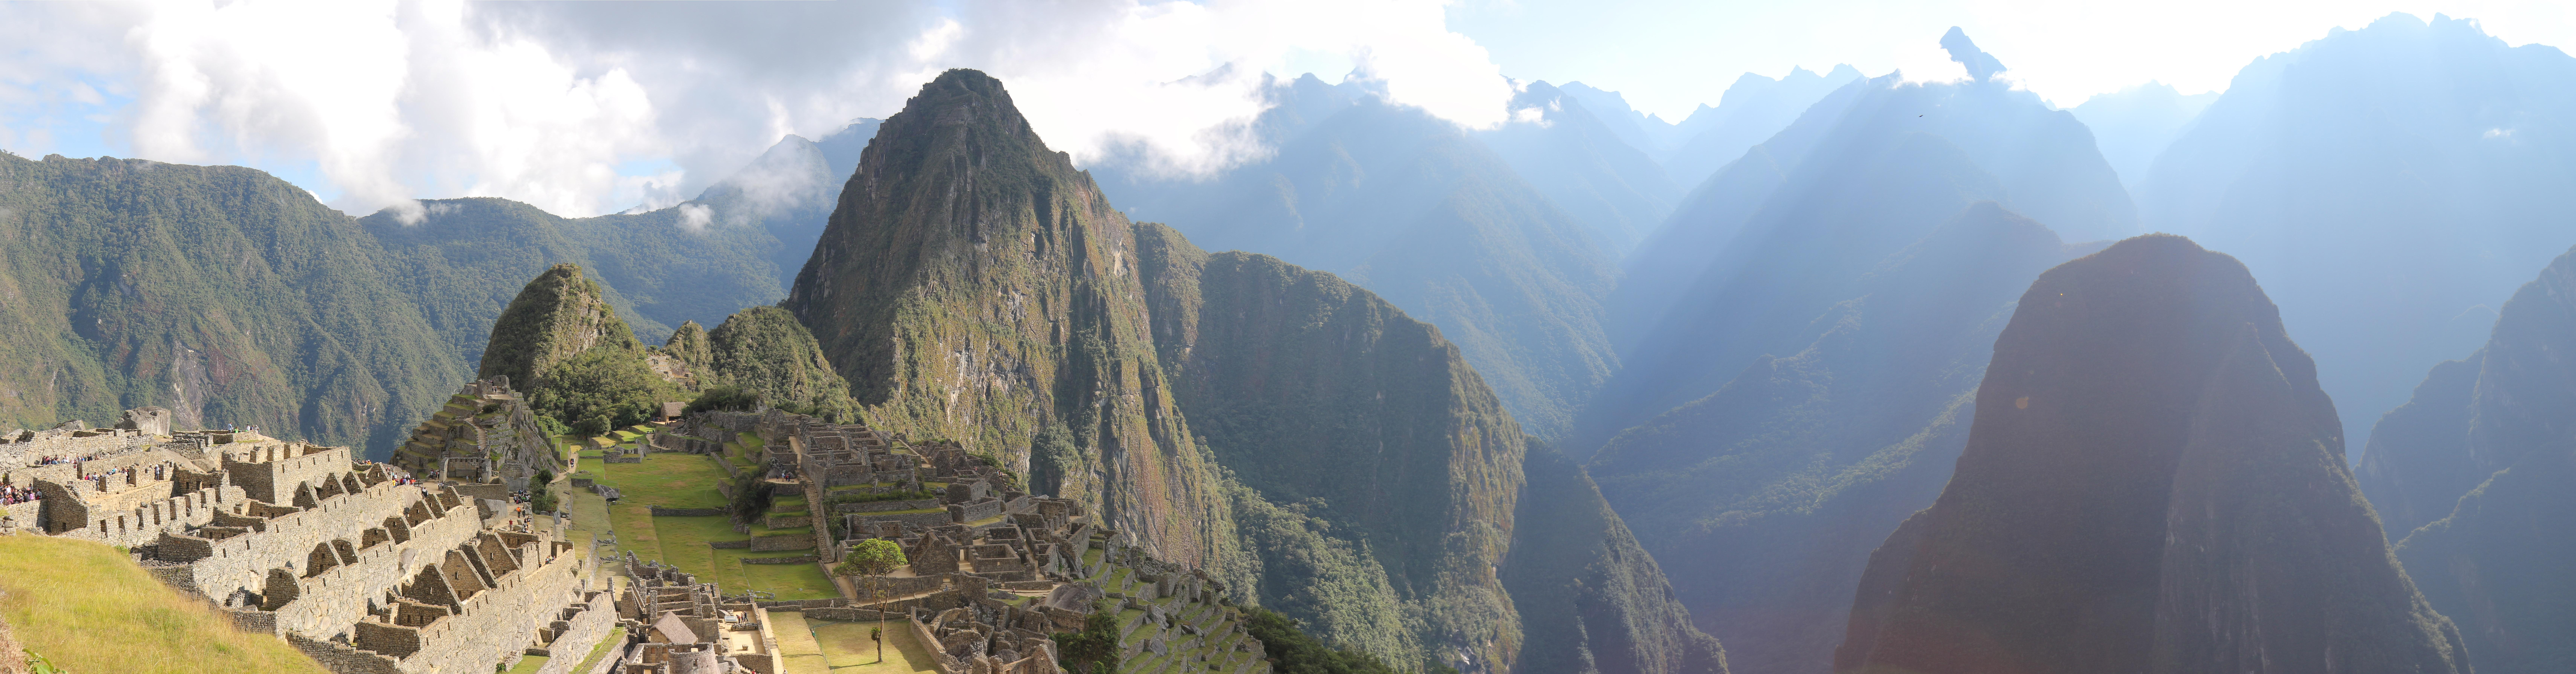 Machu Picchu Panaramic 1